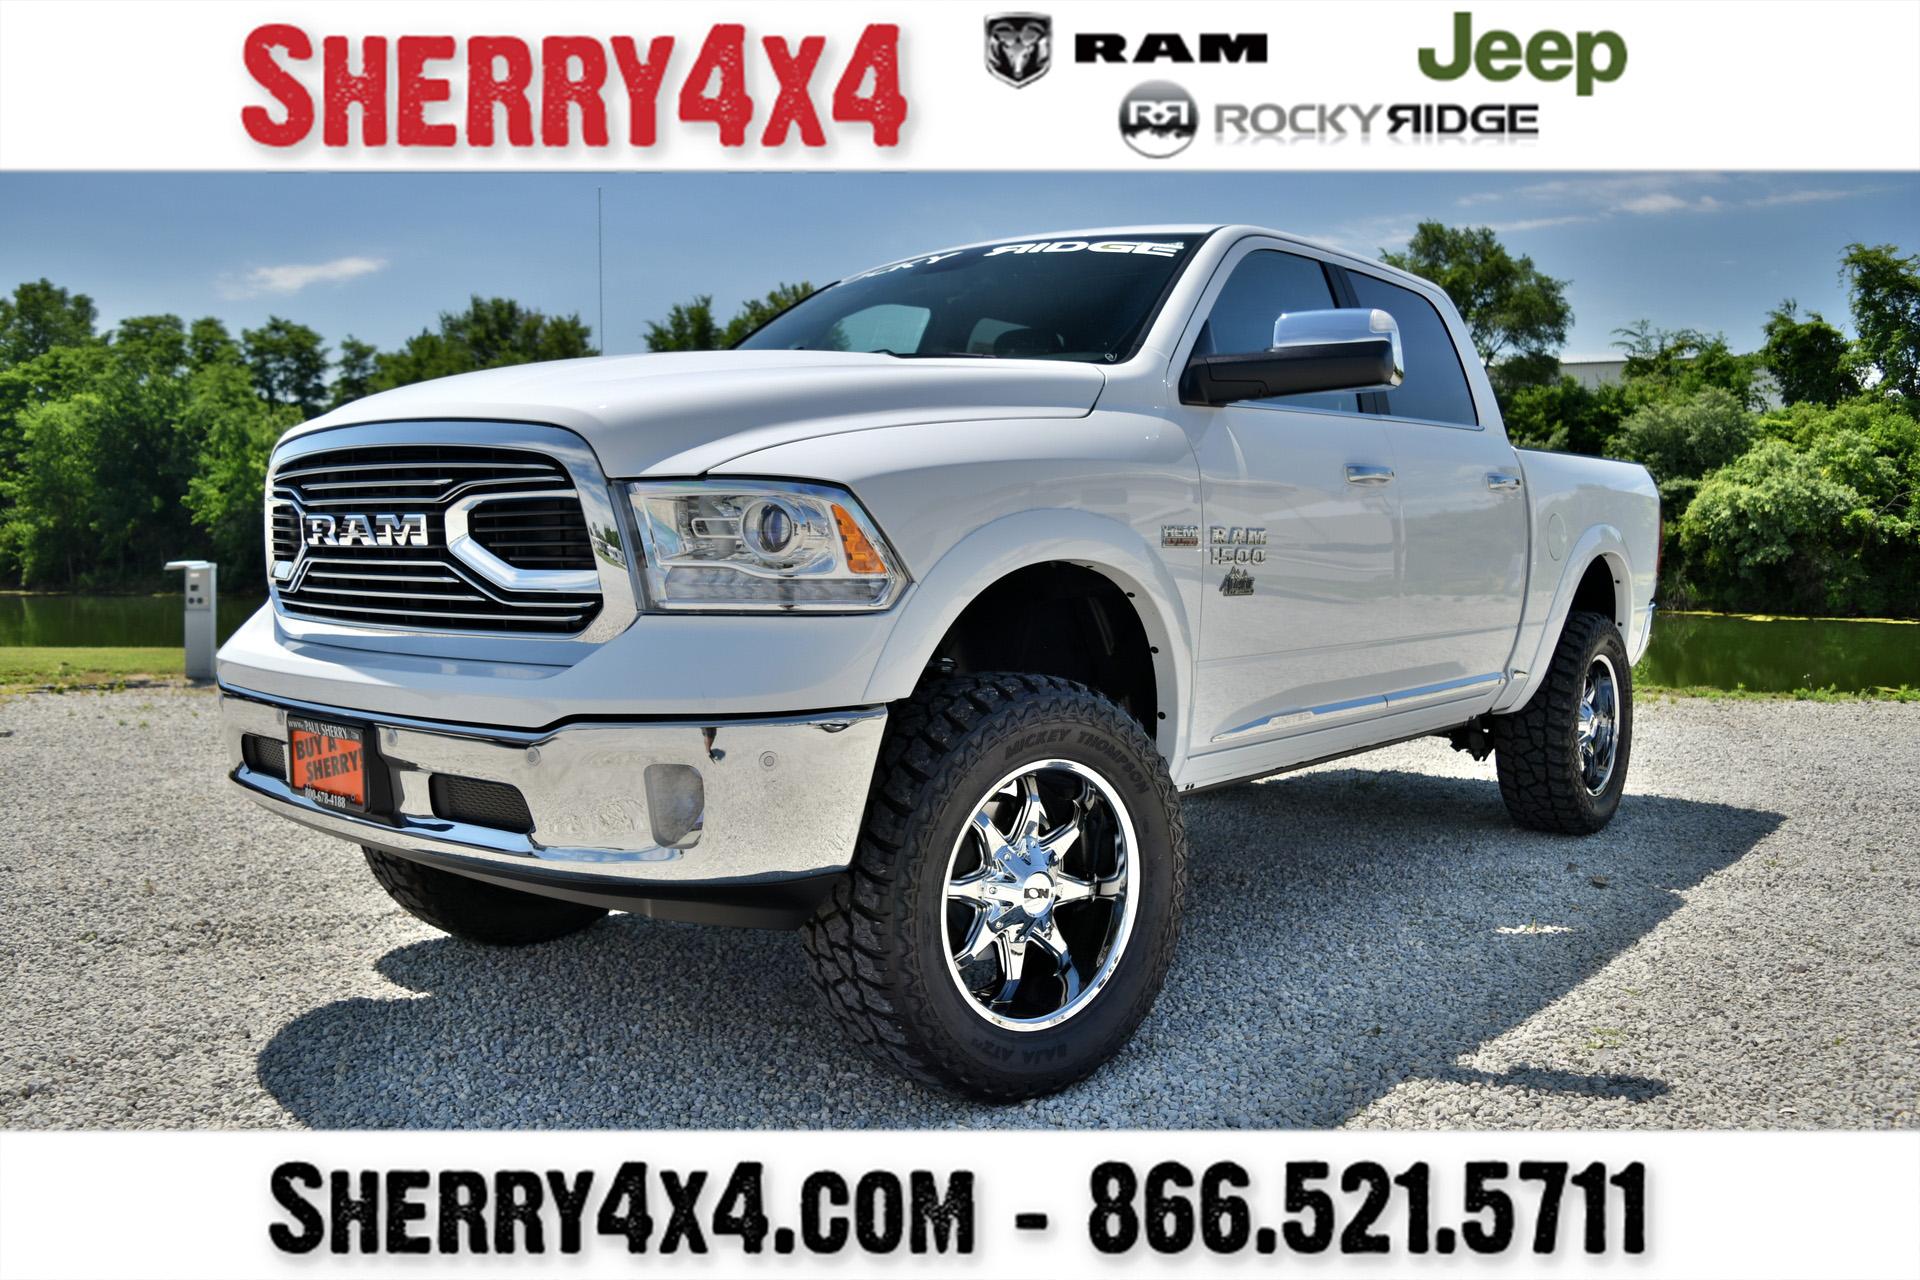 Johnson City Jeep Inventory >> 2017 Ram 1500 Paul Sherry Chrysler Dodge Jeep Ram | Autos Post